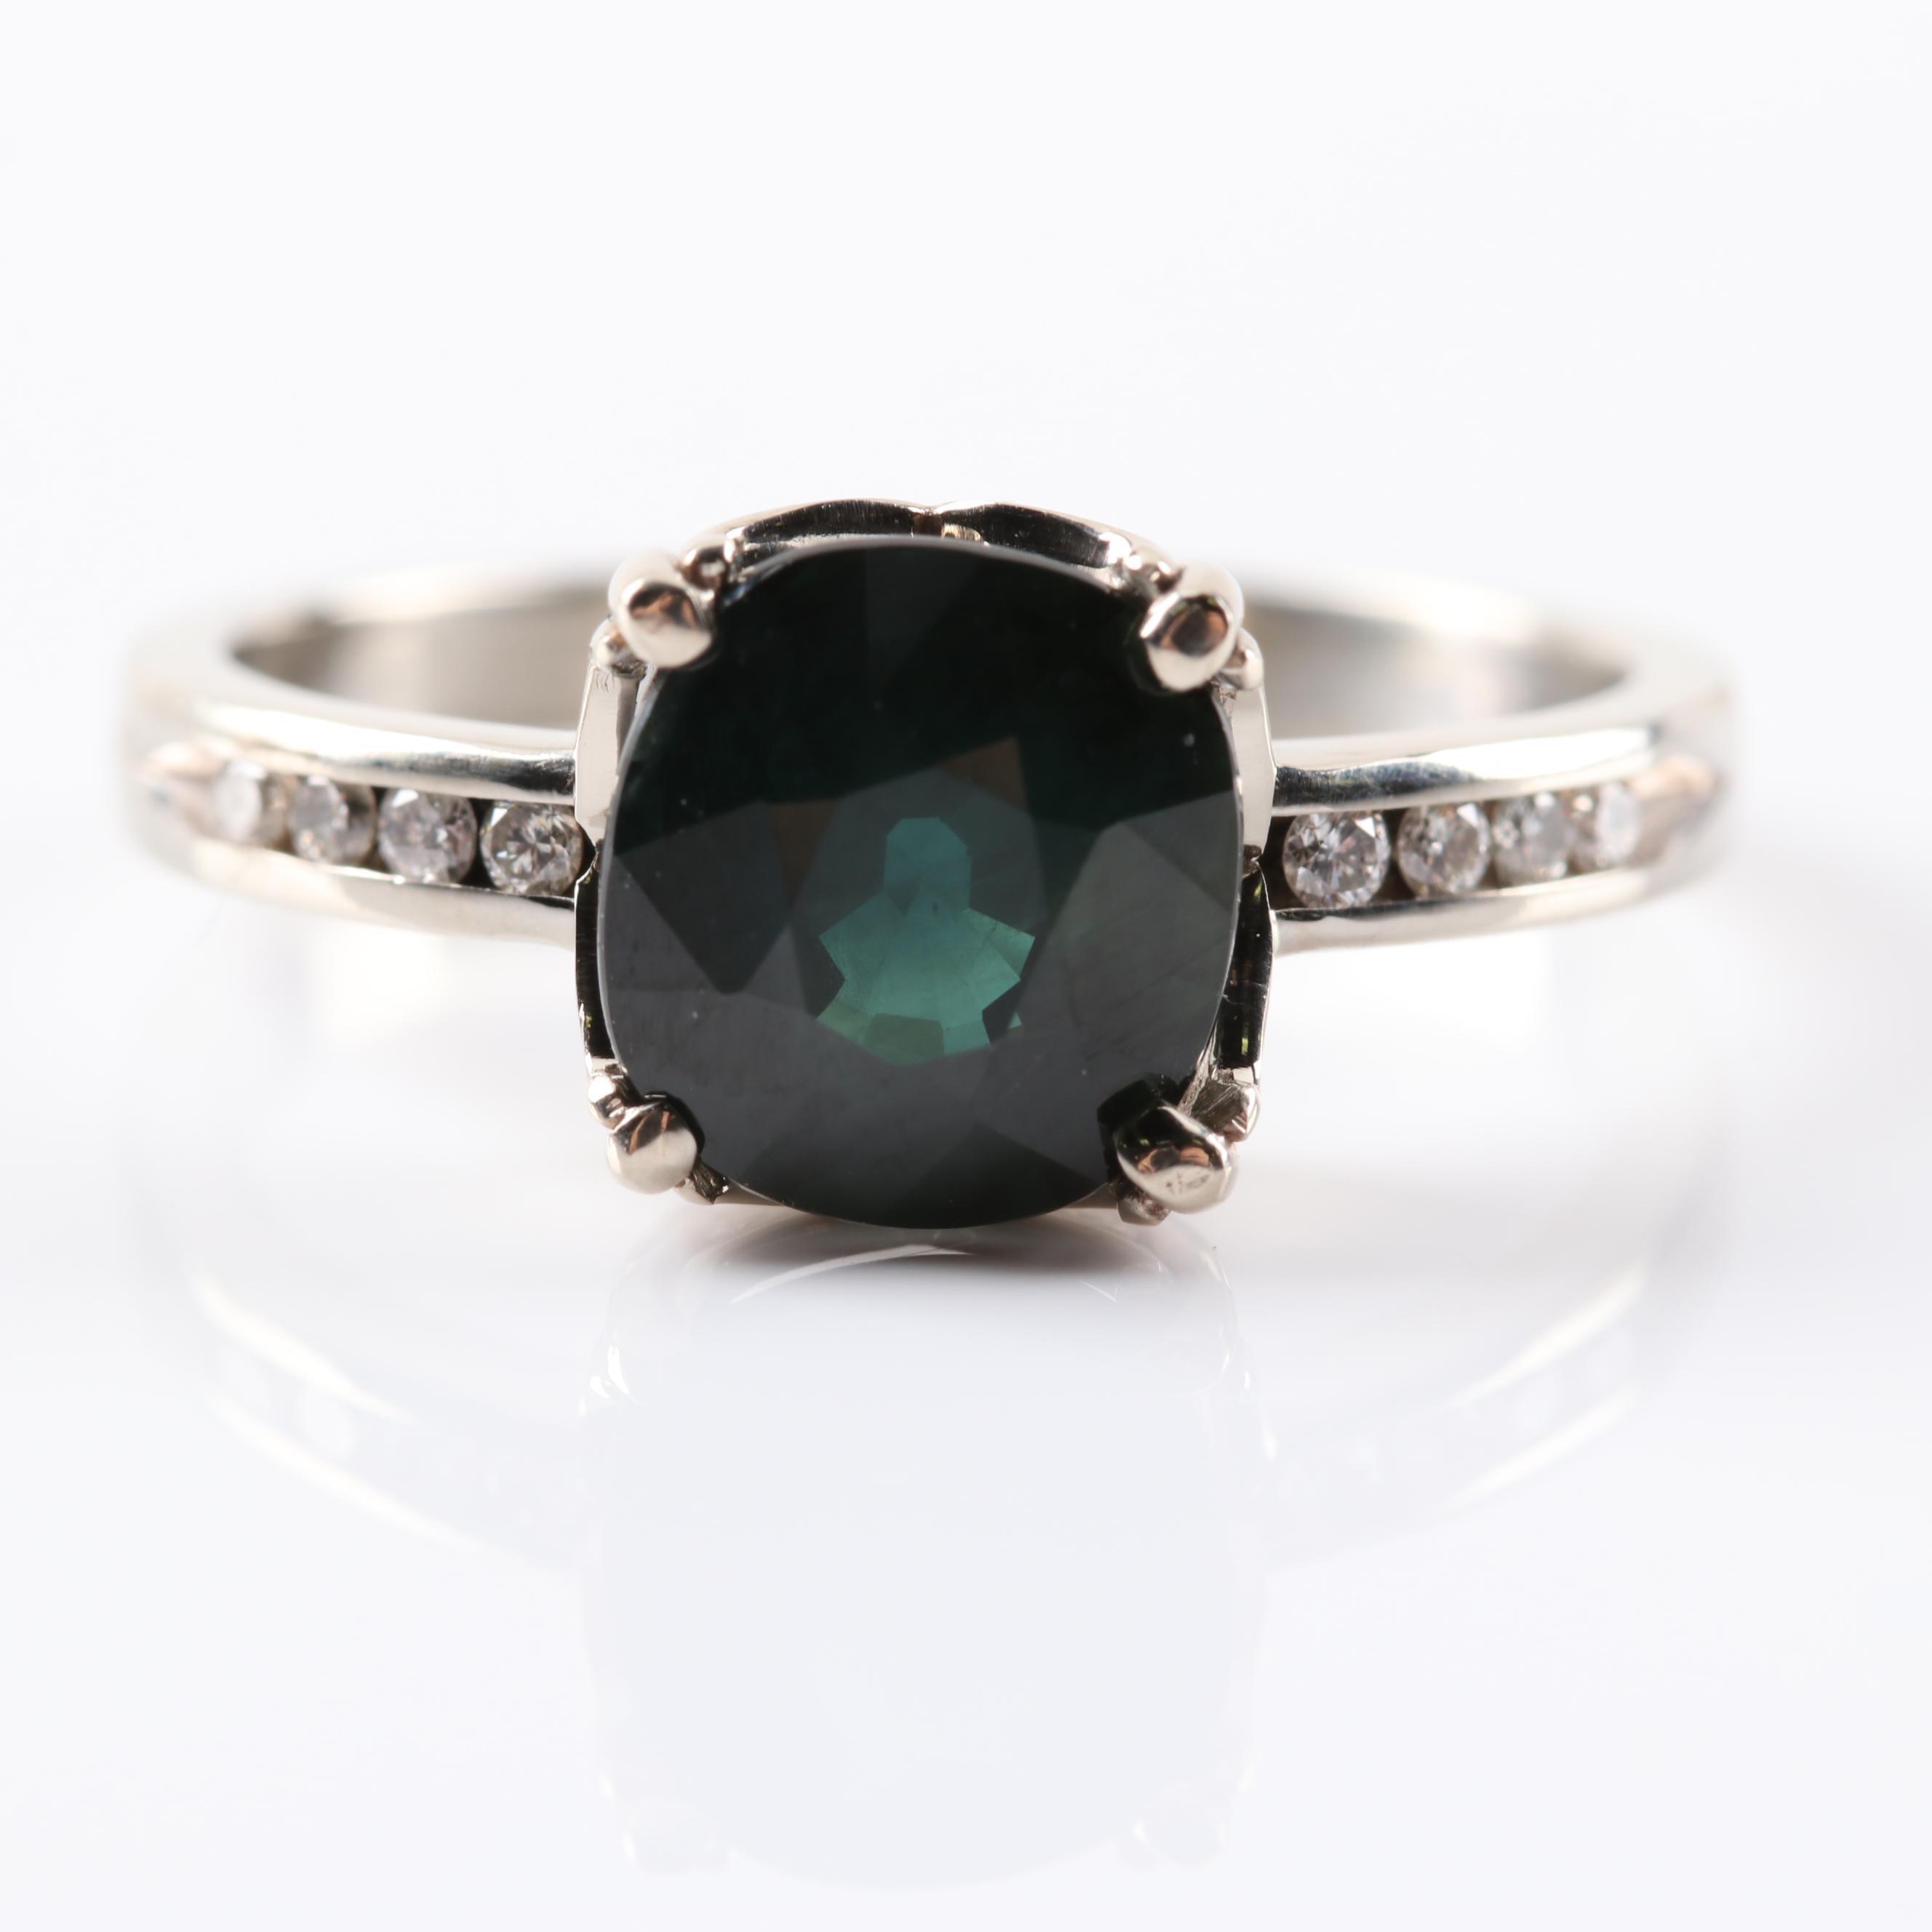 18K White Gold 2.21 CT Sapphire and Diamond Ring